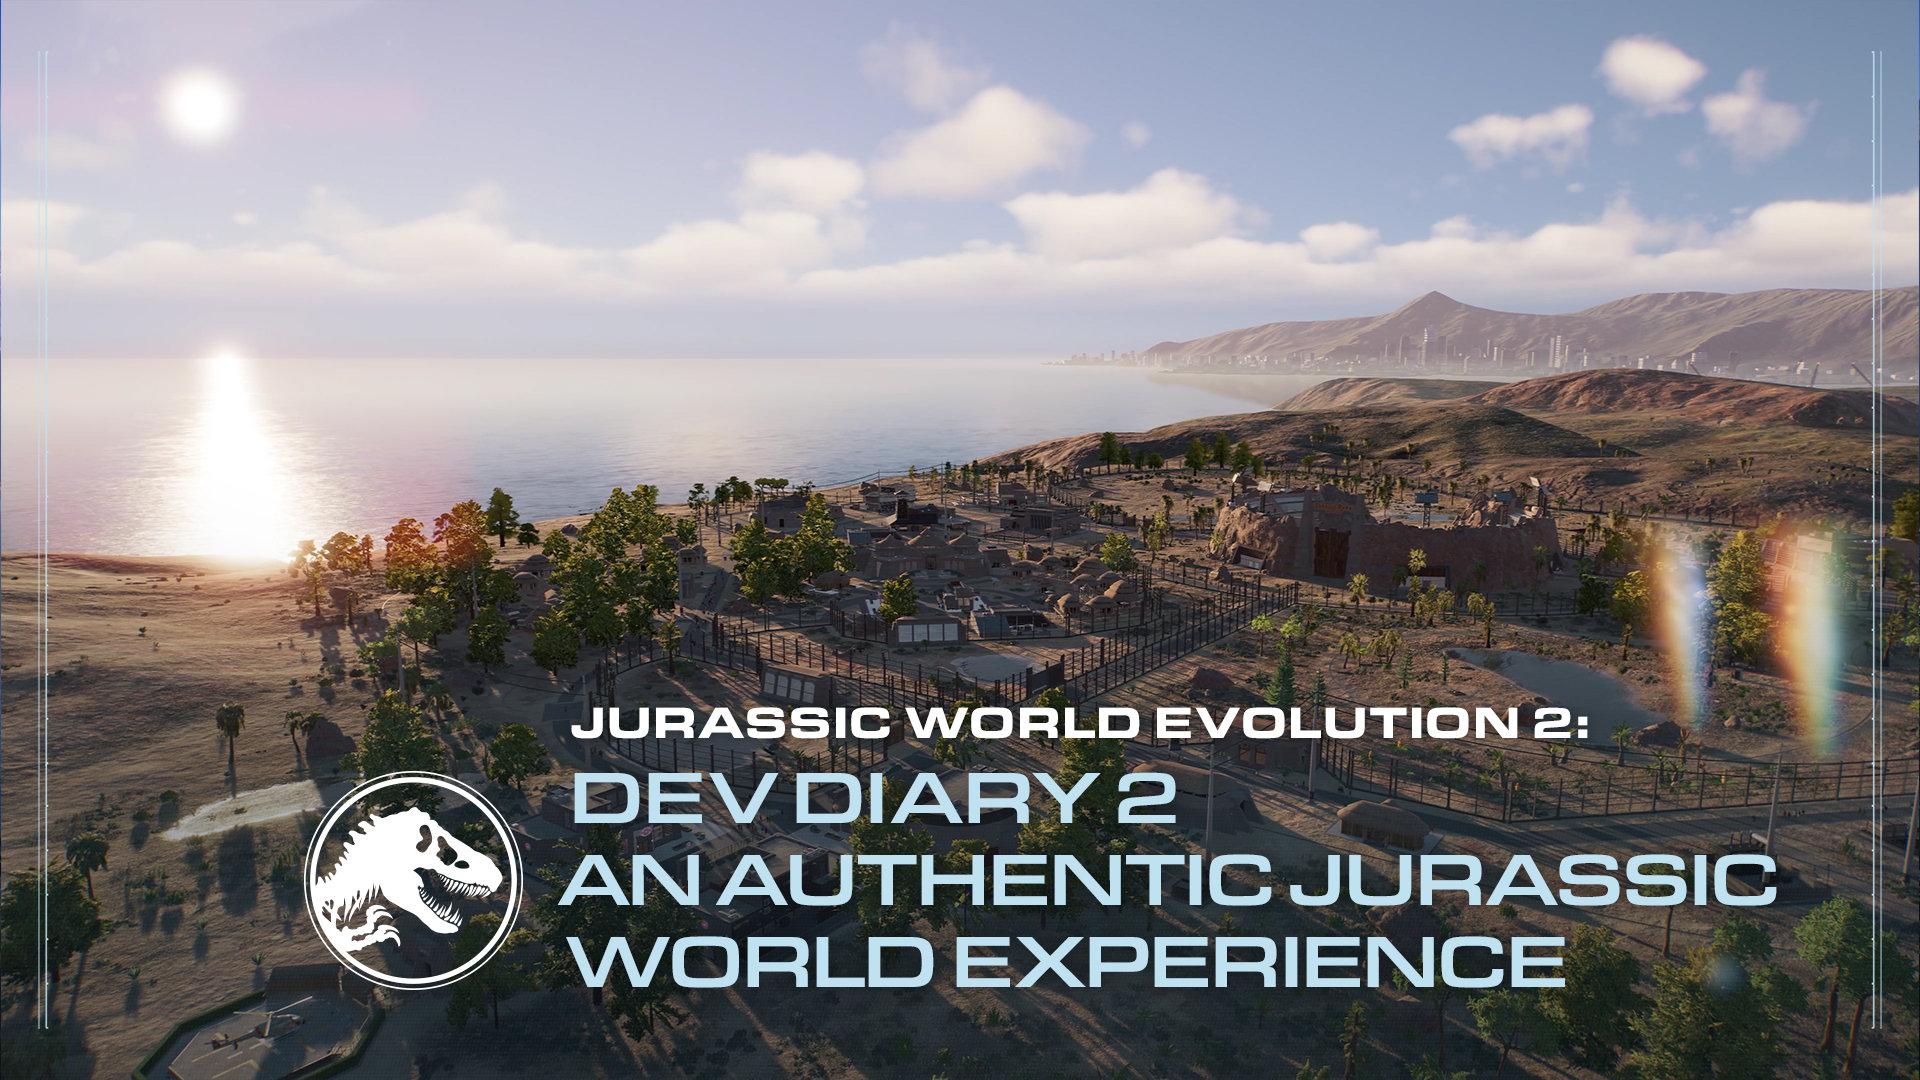 Jurassic World Evolution 2 - Dev Diary #2